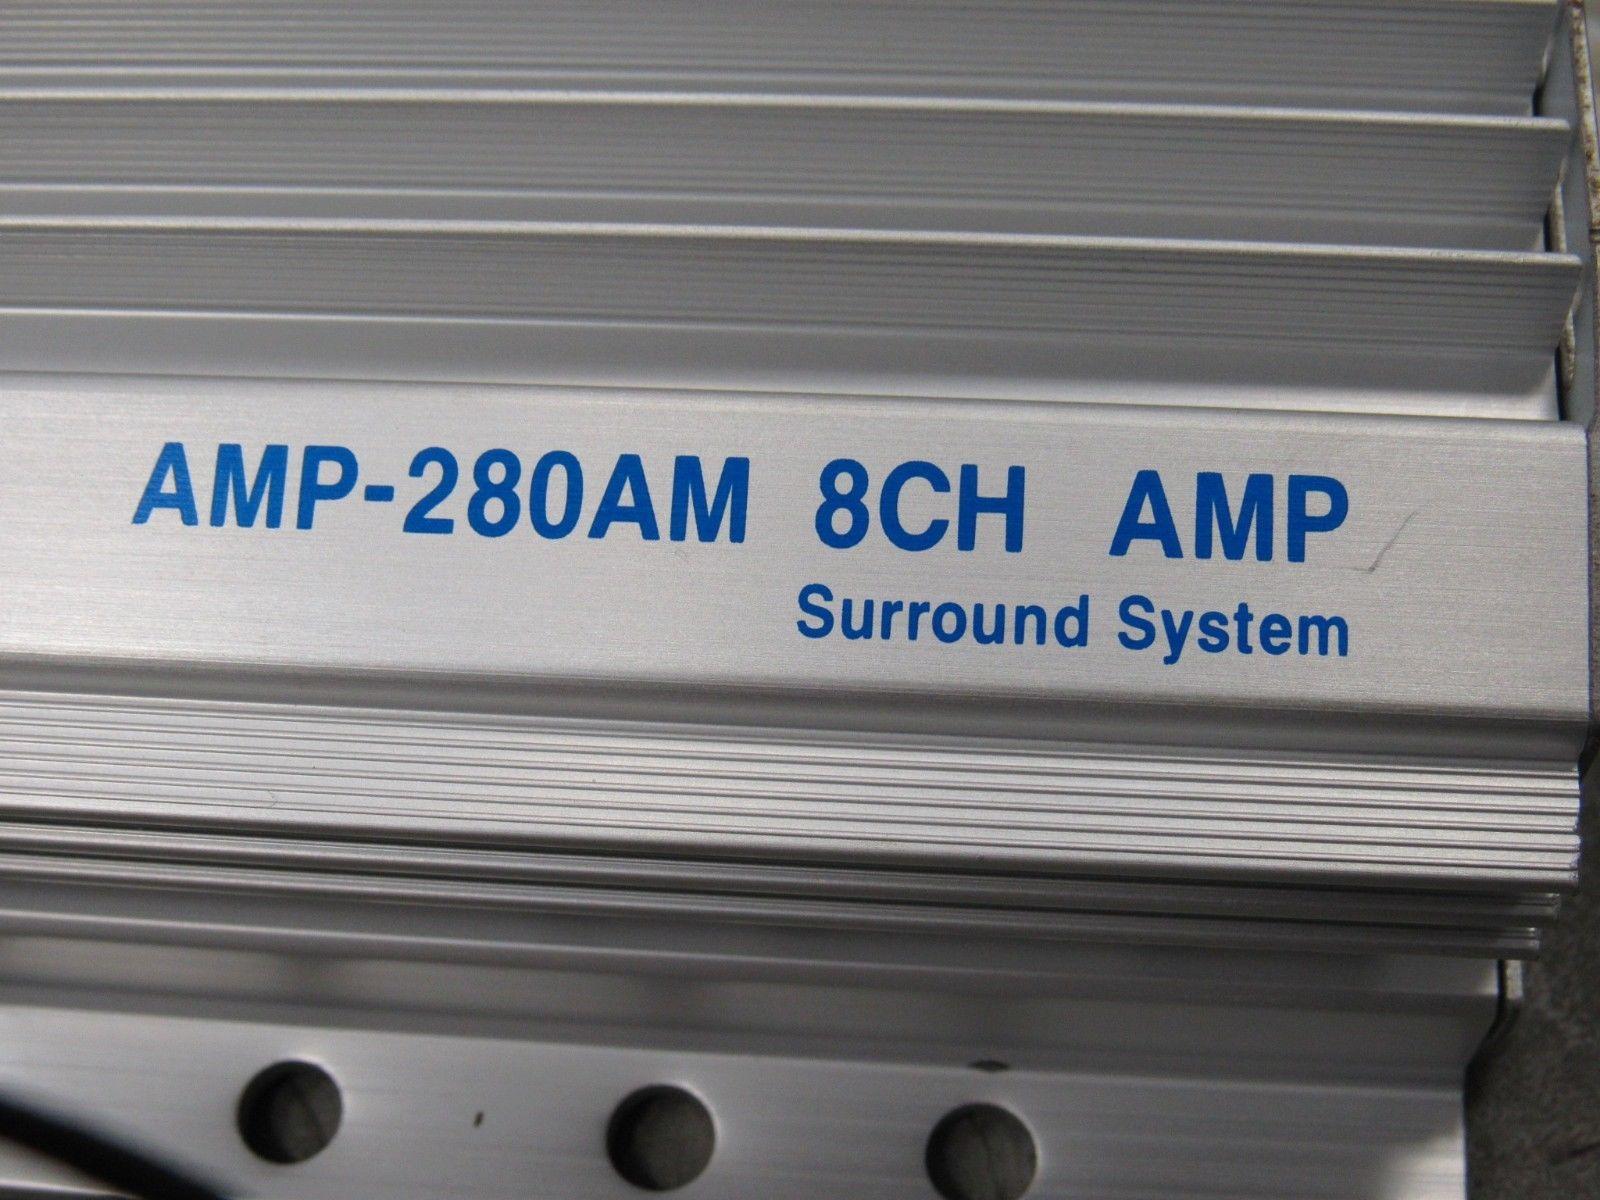 10 11 Kia Soul 8 Channel Surround Audio Radio Stereo Amplifier Amp System Wiring 96370 2k000 E